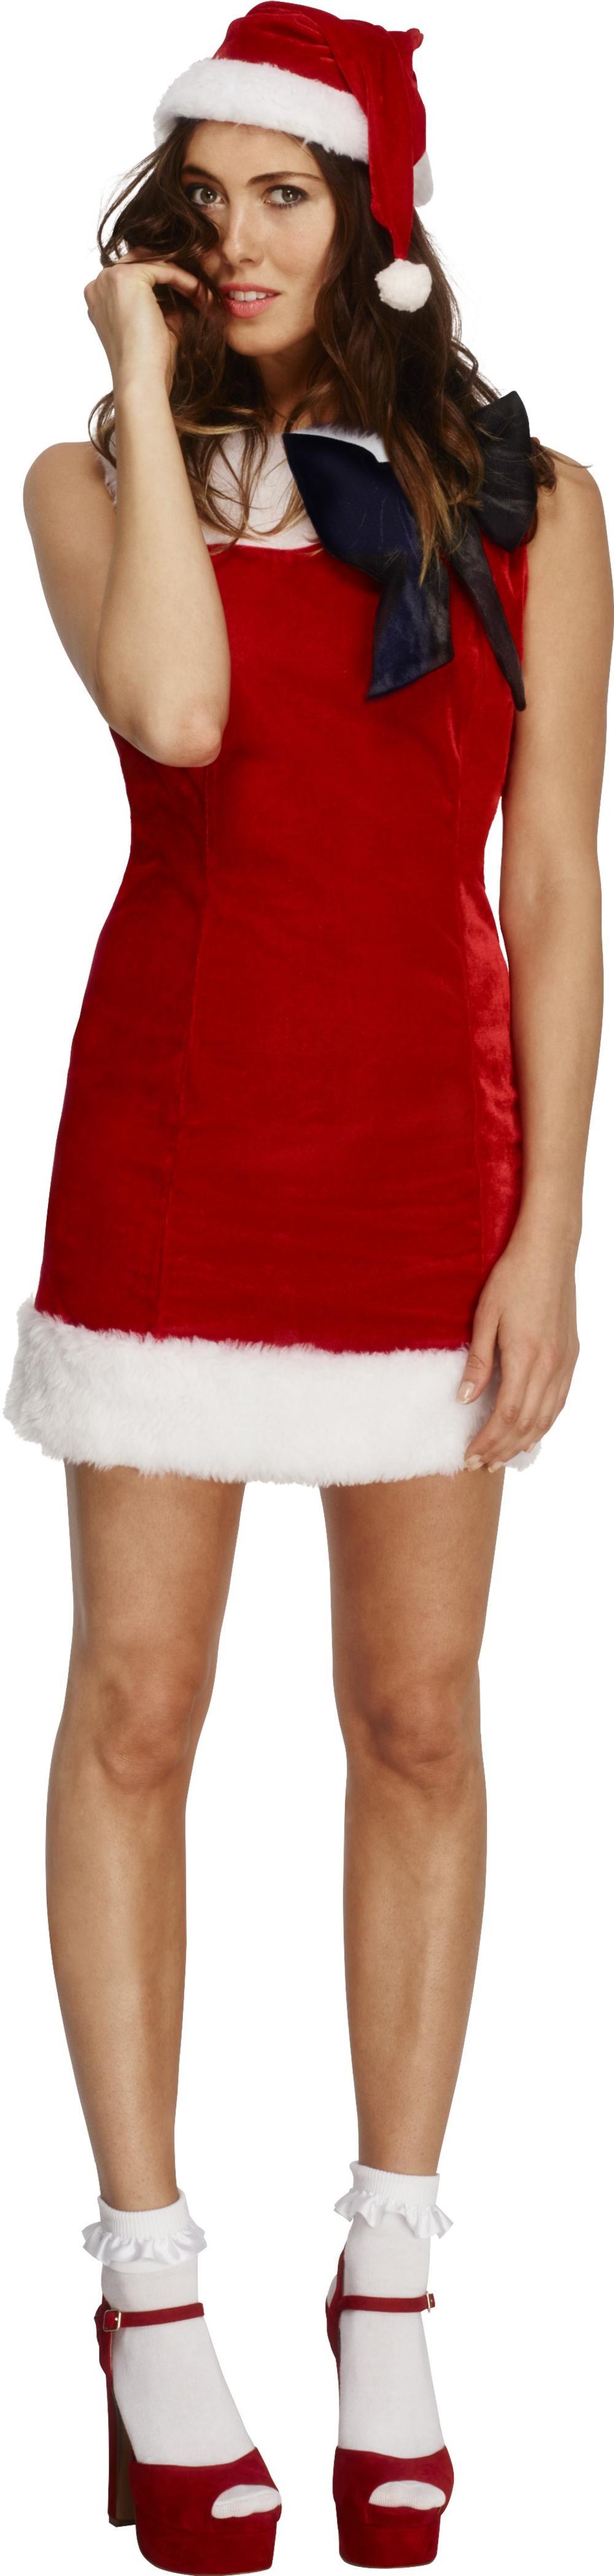 Fever Miss Santa Cutie Claus Ladies Fancy Dress Christmas Womens Adults Costume